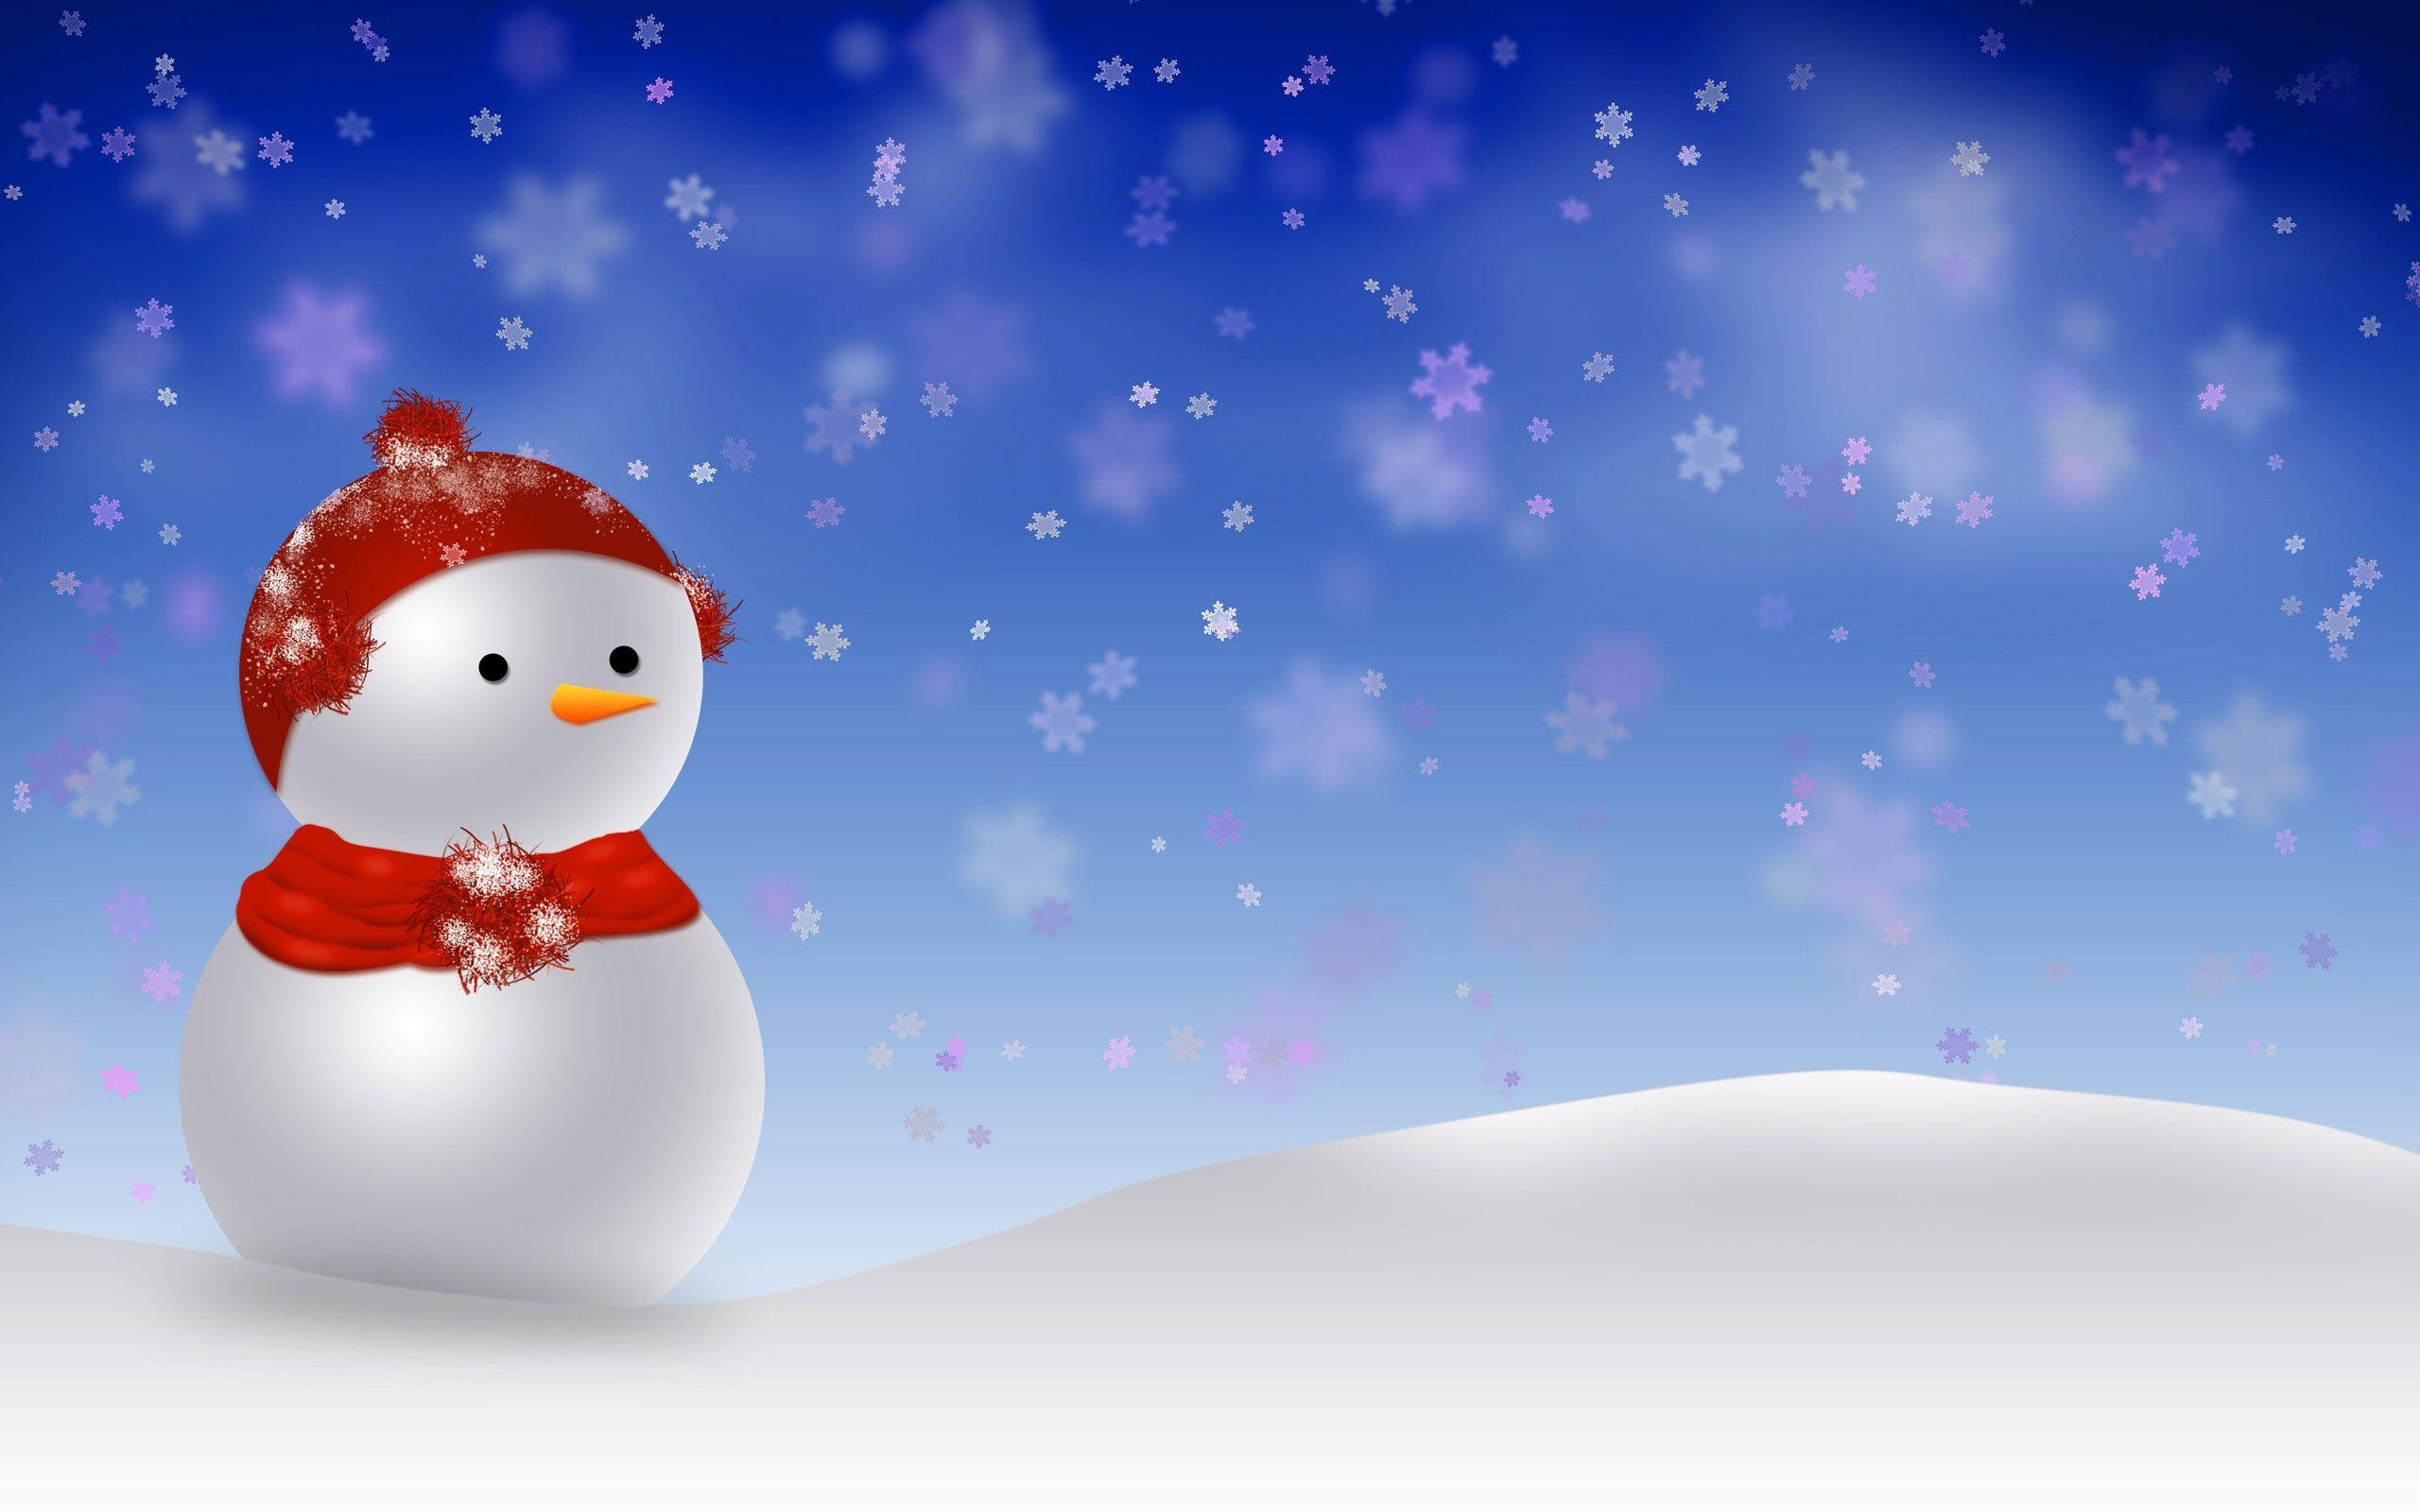 Cute Christmas Desktop Backgrounds  Wallpaper Cave